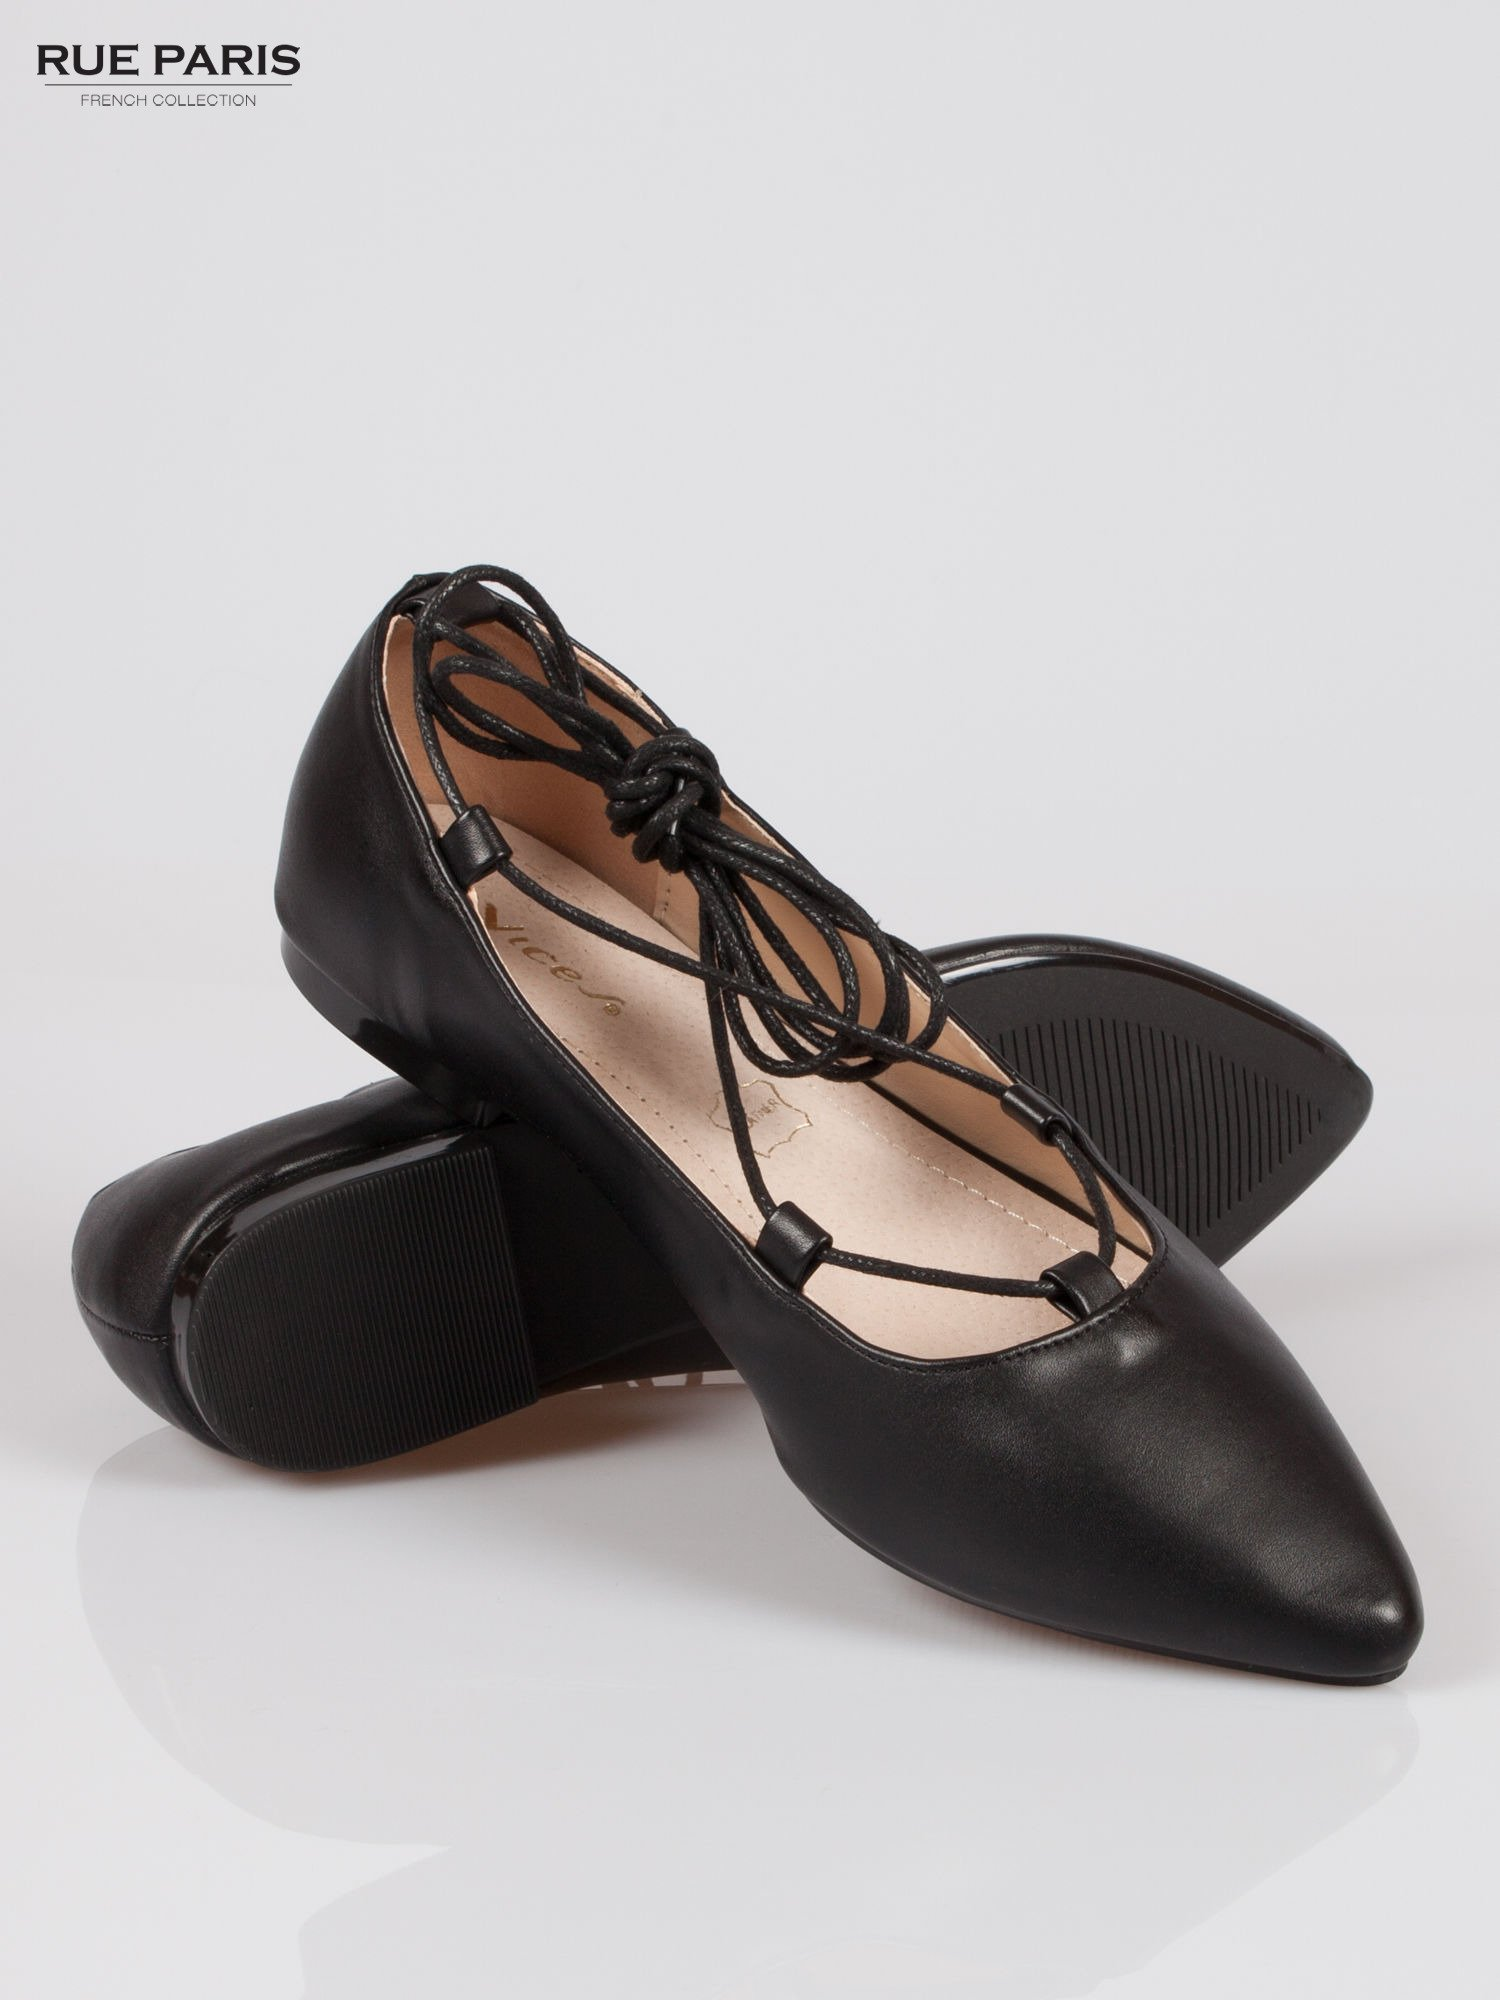 Czarne wiązane baleriny leather Kylie lace up                                  zdj.                                  4